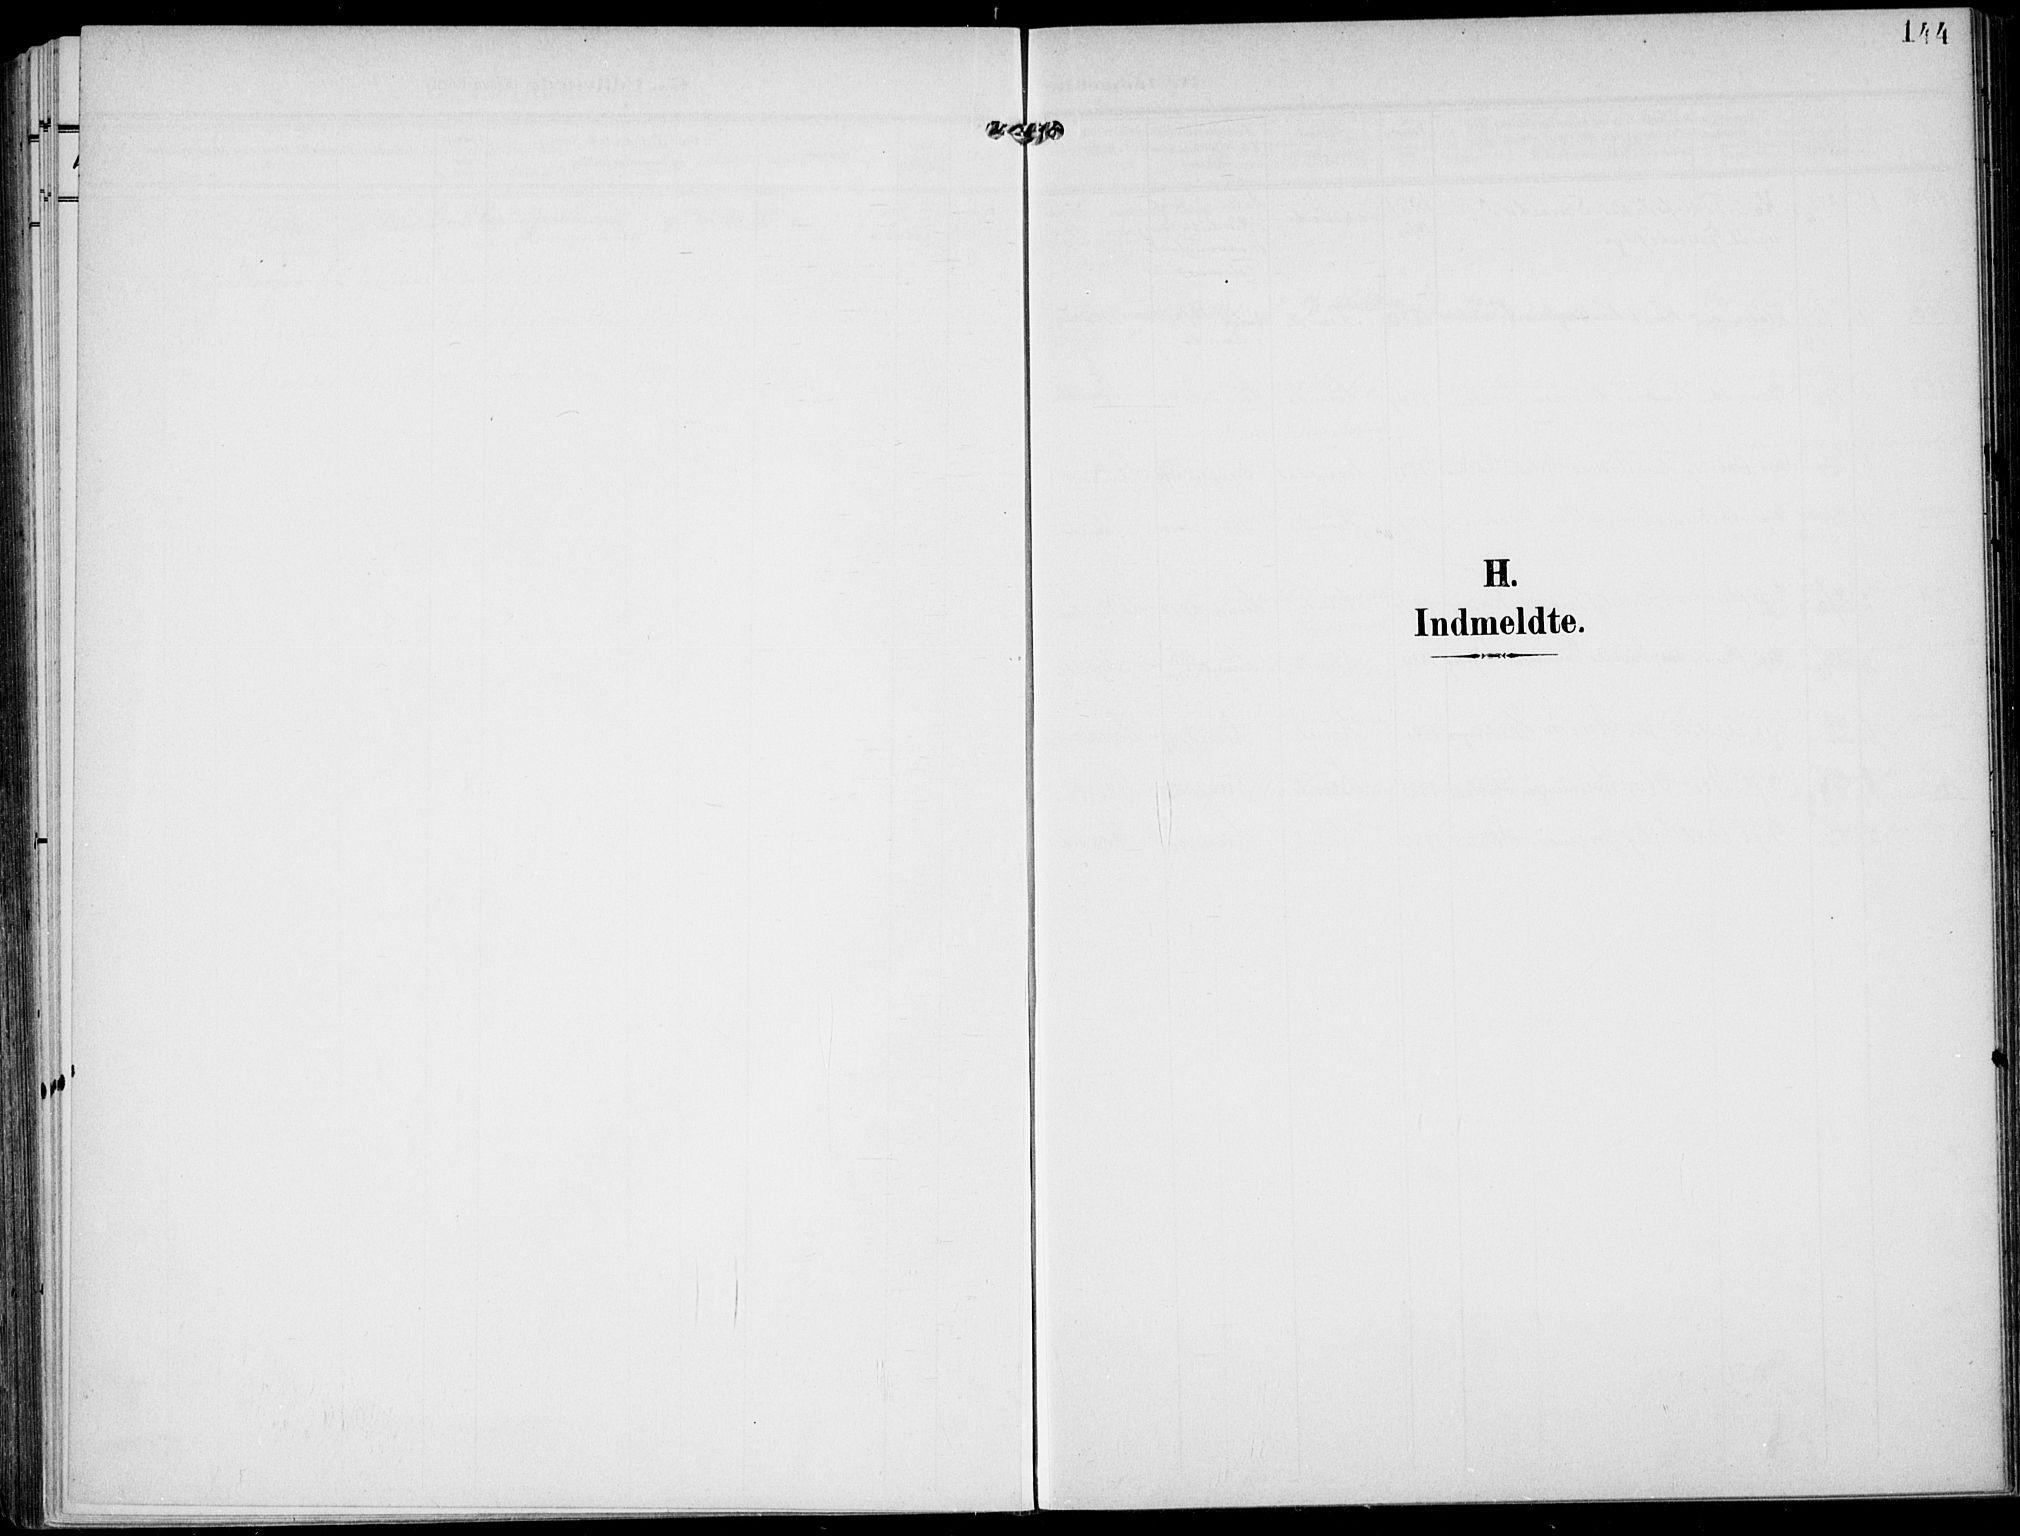 SAKO, Lunde kirkebøker, F/Fa/L0004: Ministerialbok nr. I 4, 1902-1913, s. 144